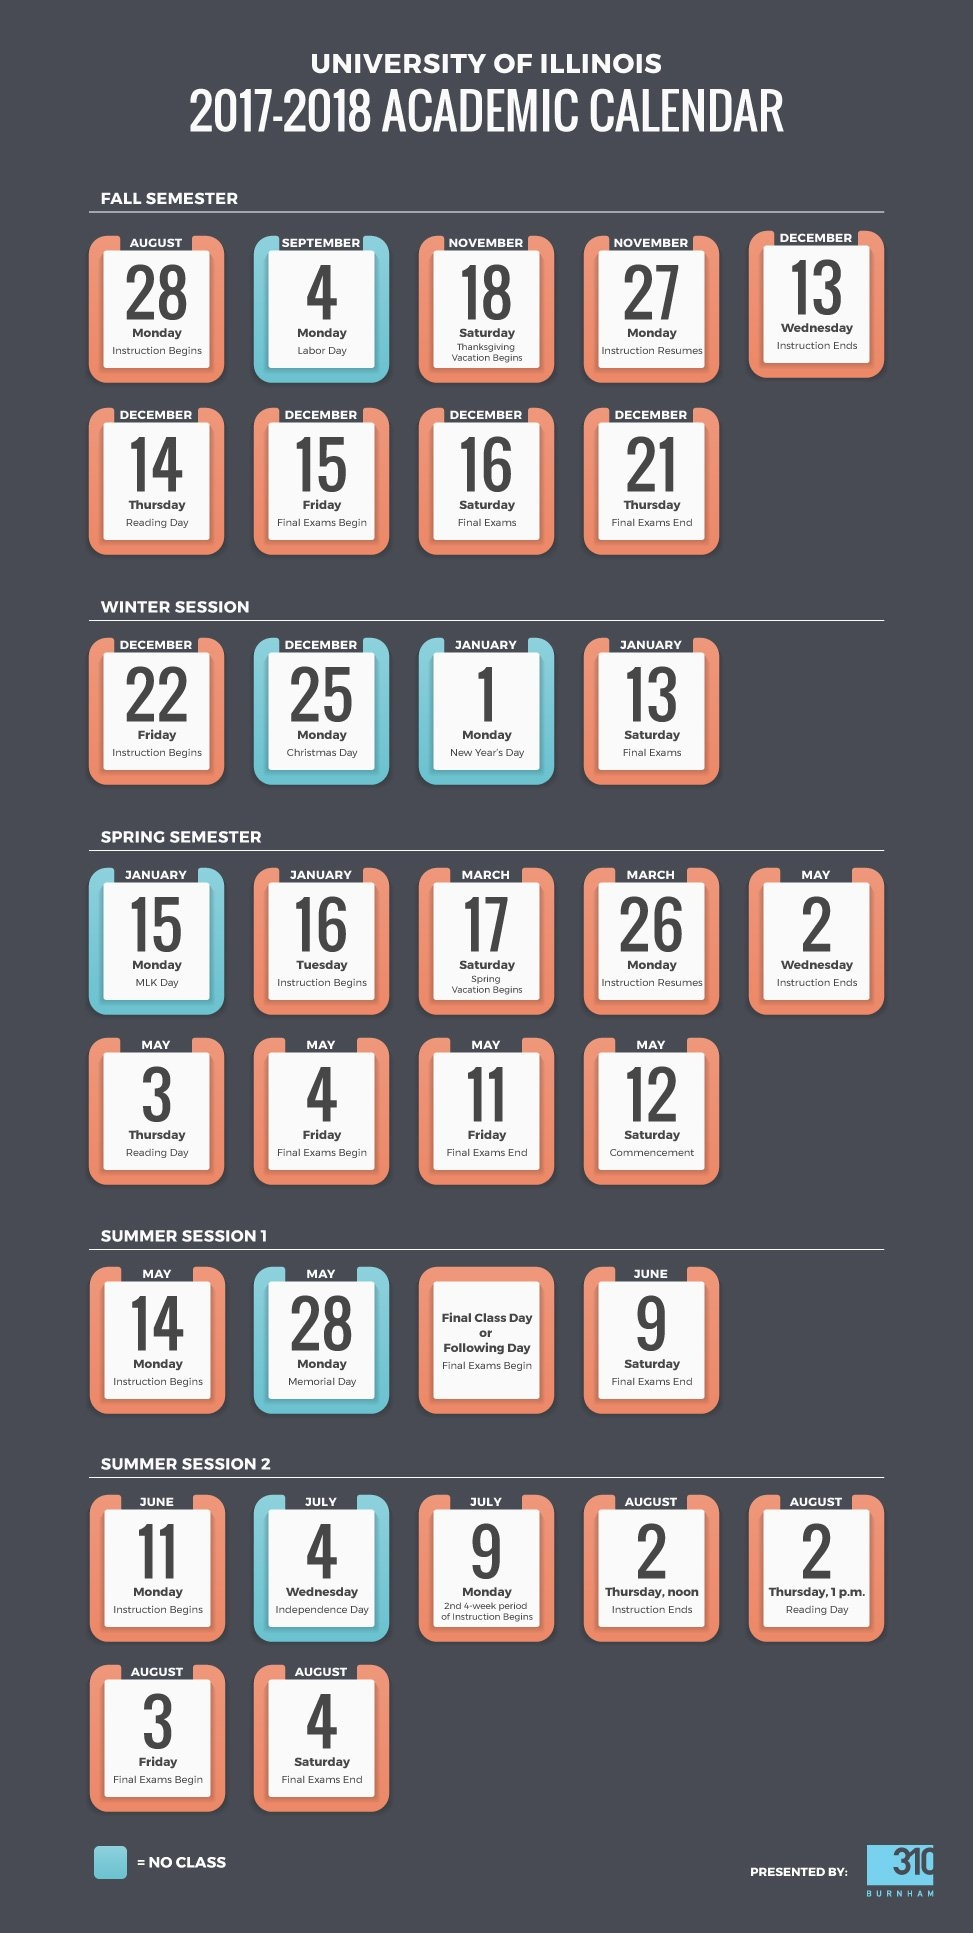 Uiuc Academic Calendar 2017 2018: School Schedule Infographic Calendar 2019 Uiuc